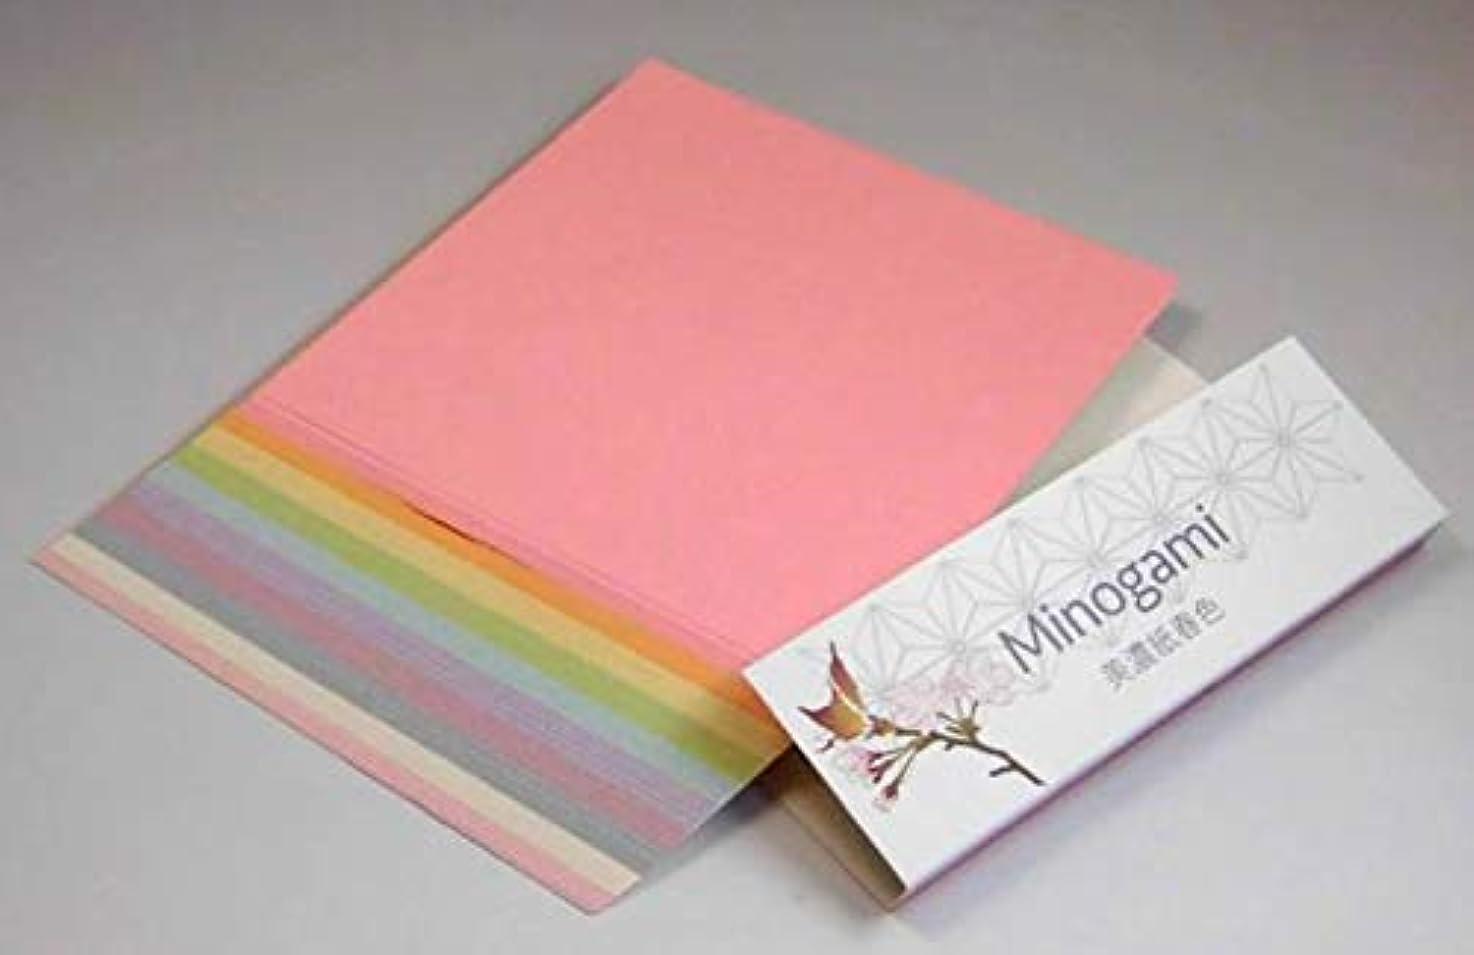 鎮痛剤薄い苦難Minogami 美濃紙 春色 MP-M1